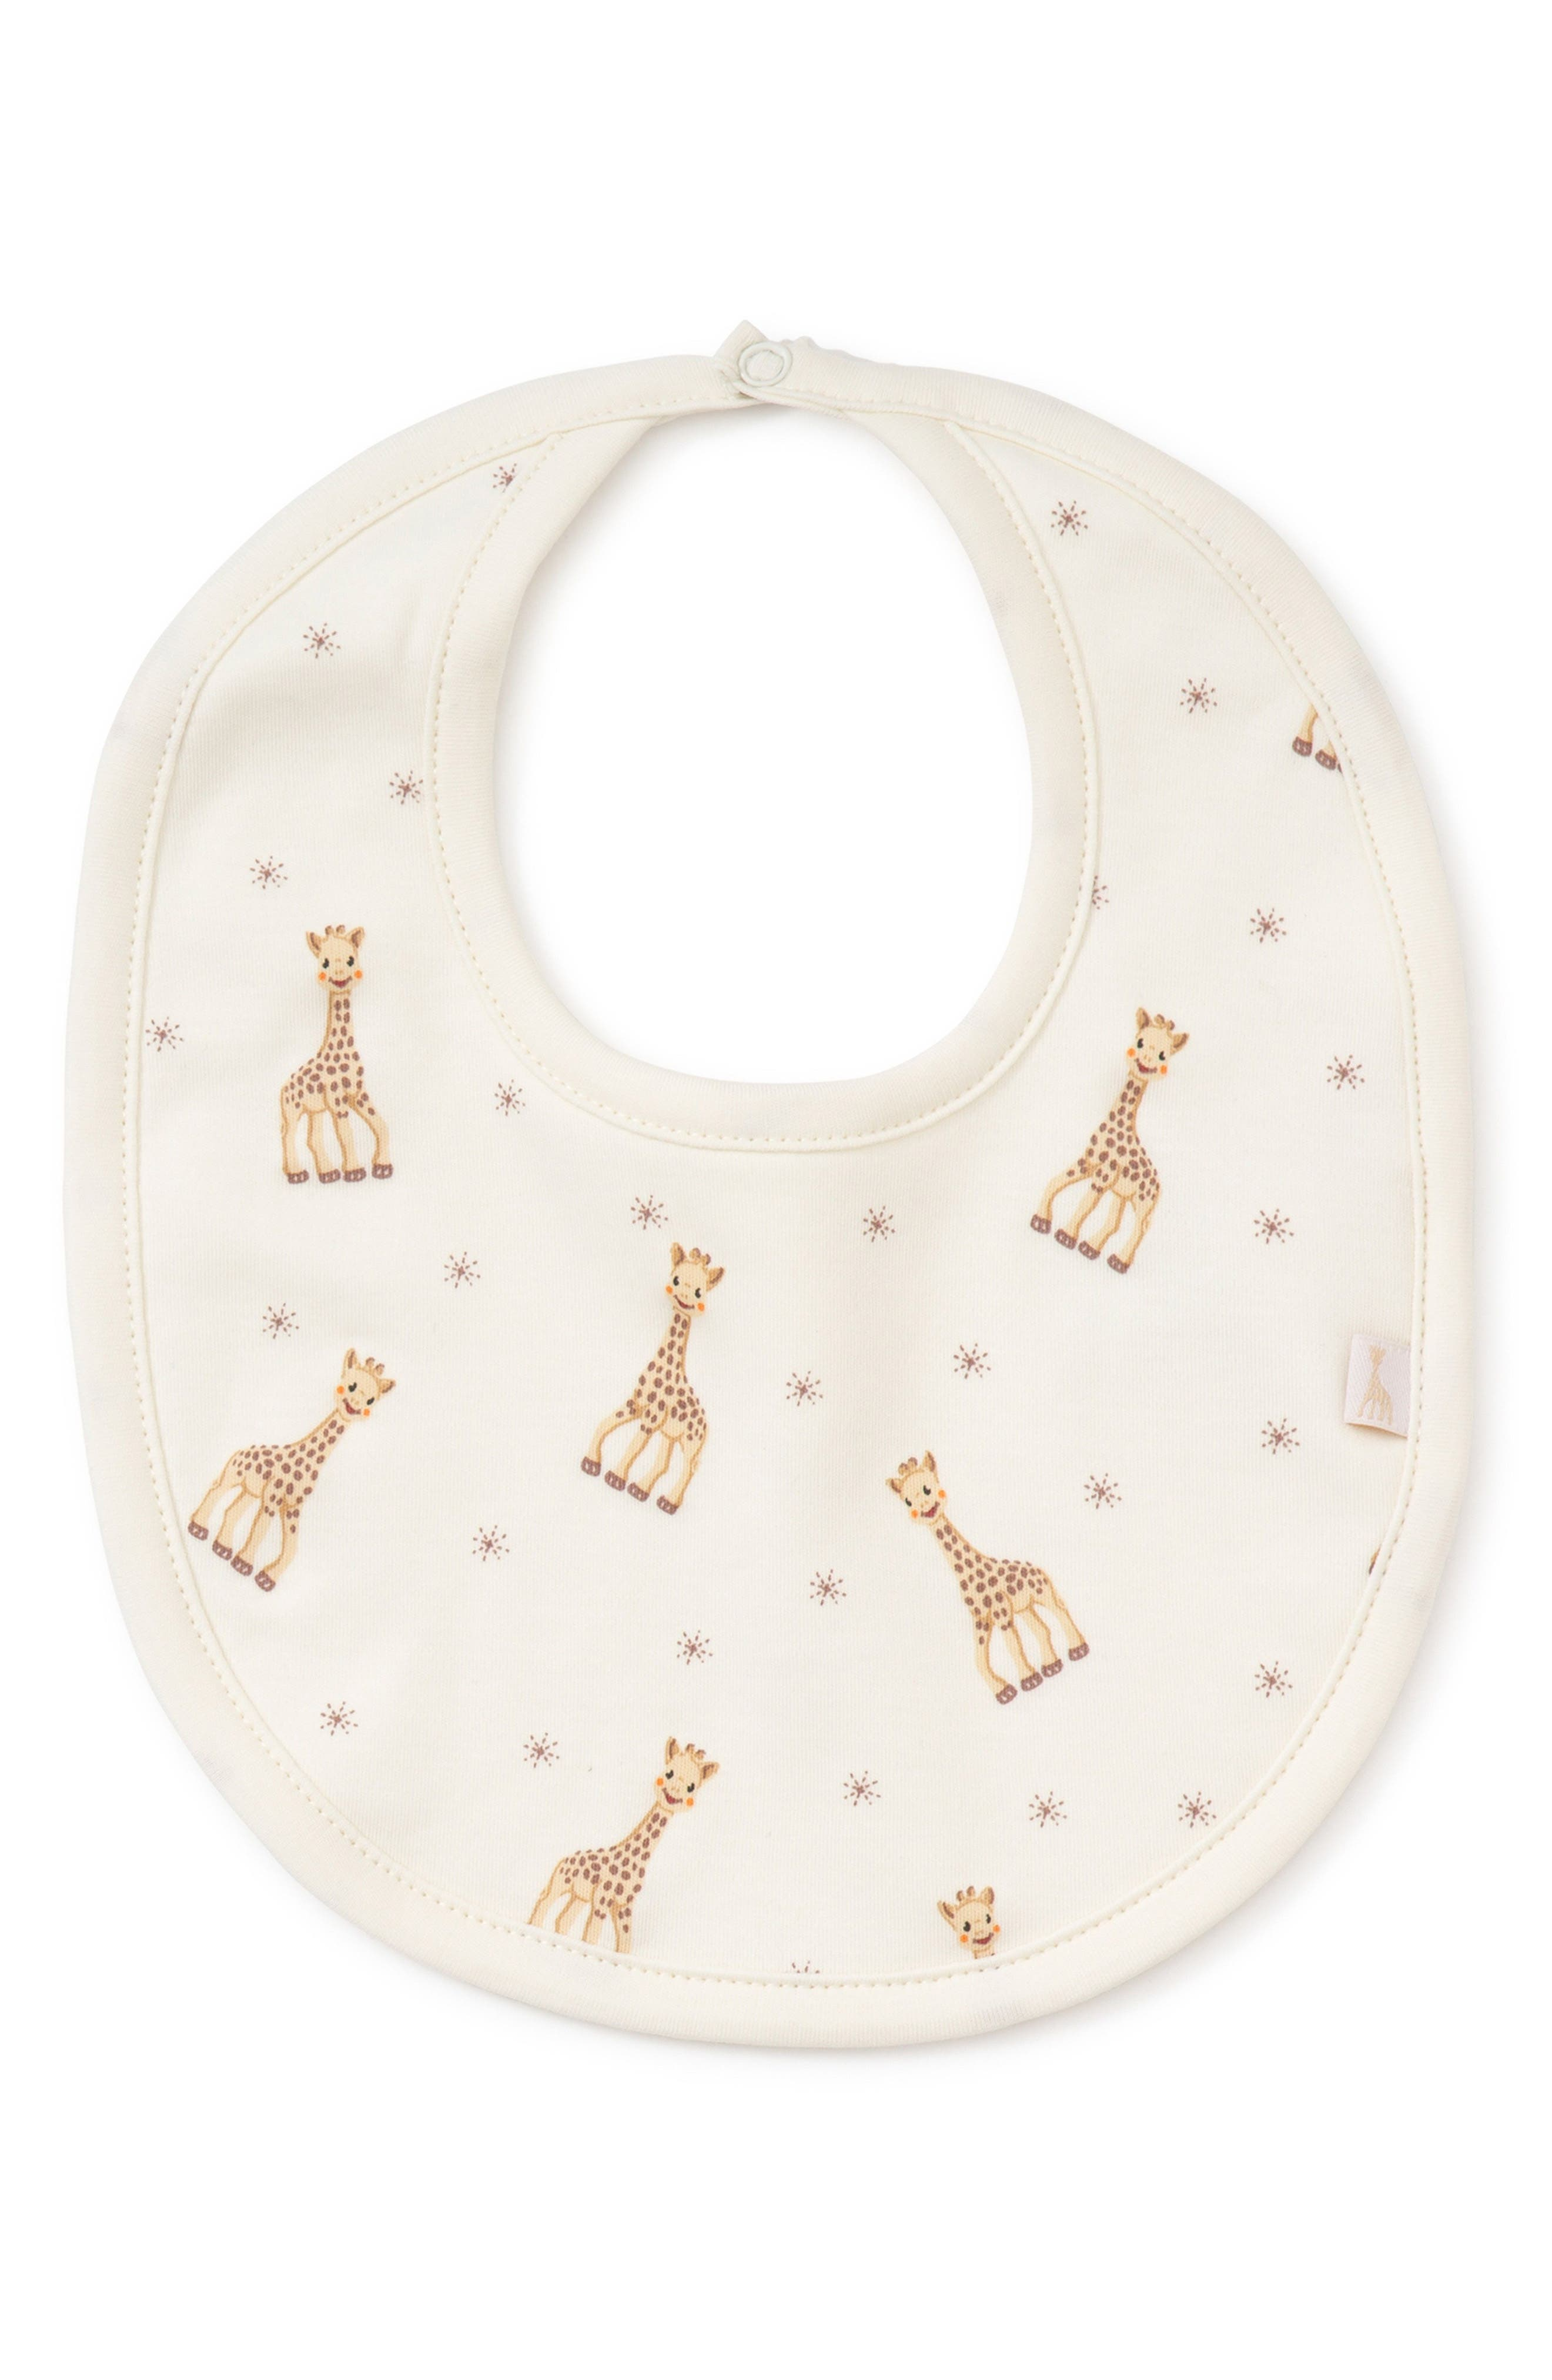 x Sophie la Girafe Bib,                         Main,                         color, Ecru